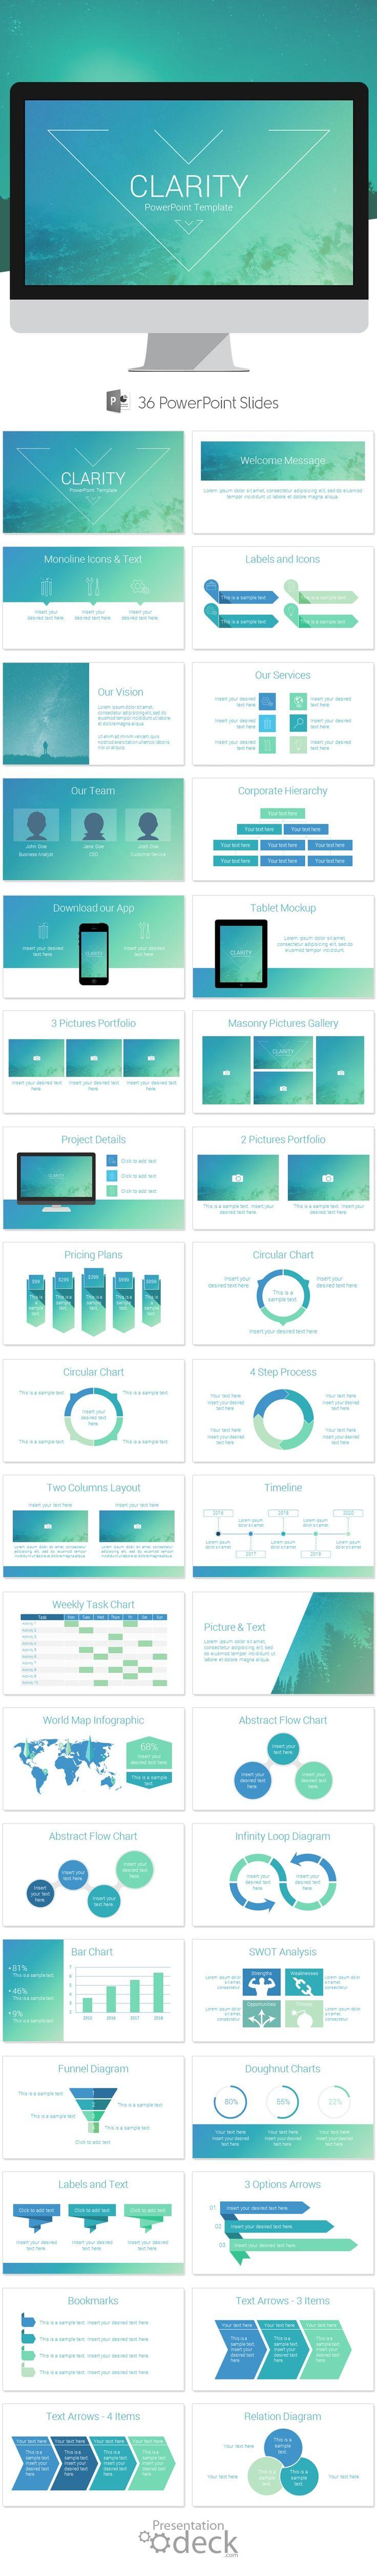 Clarity Powerpoint Template Presentationdeck Com